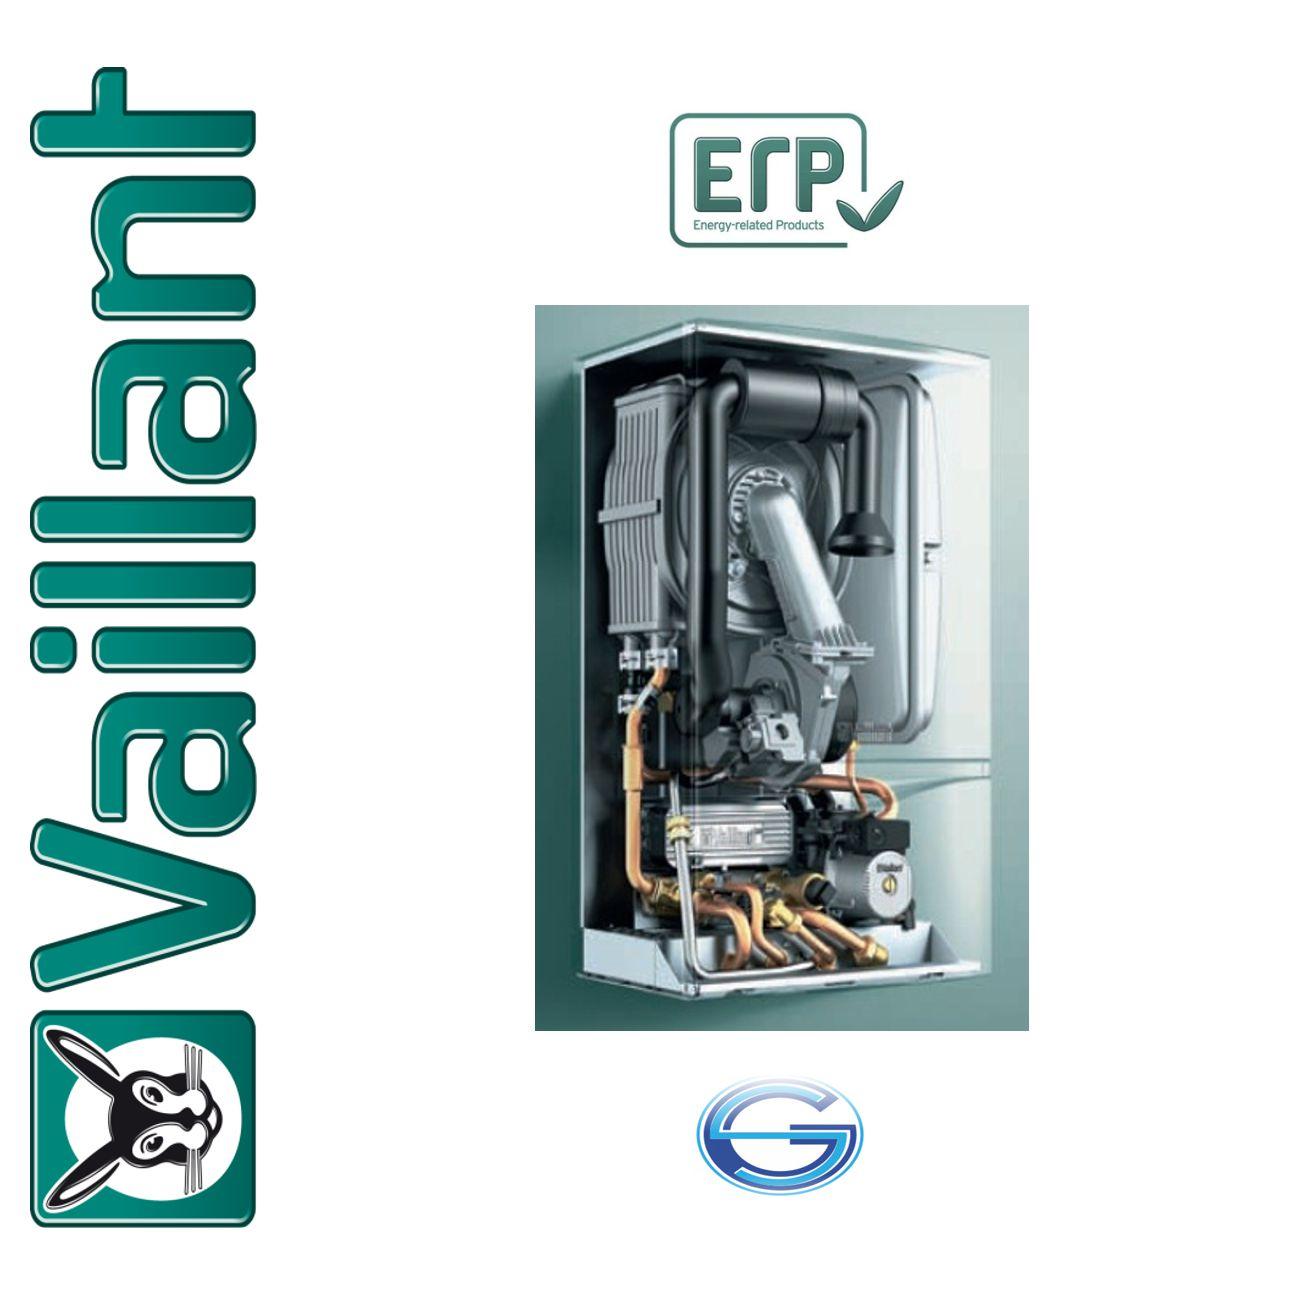 Caldera de gas condensación Vaillant ecoTEC plus VMW ErP interior